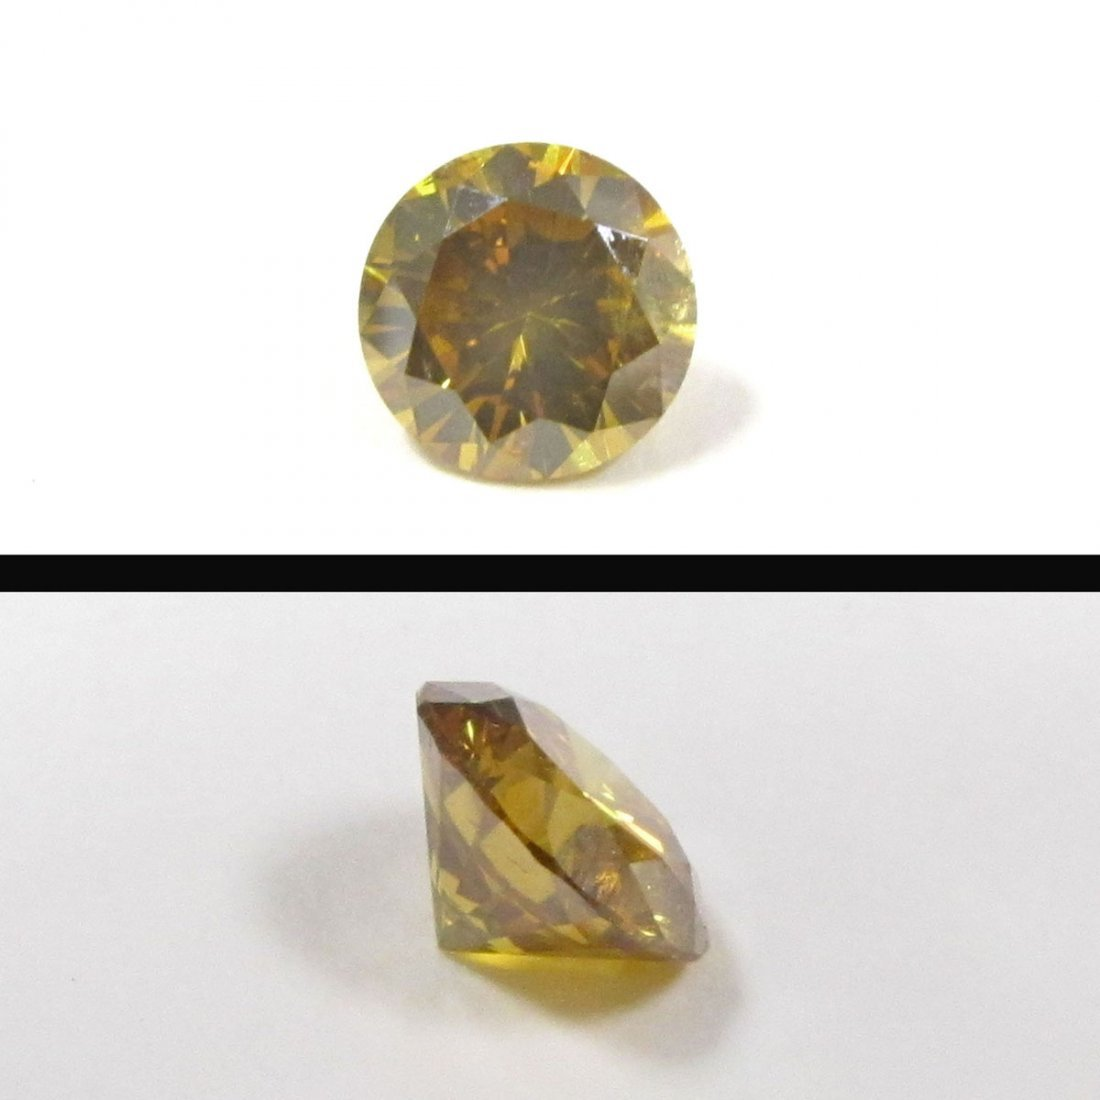 FANCY NATURAL DEEP BROWNISH ORANGY-YELLOW DIAMOND, 1.17